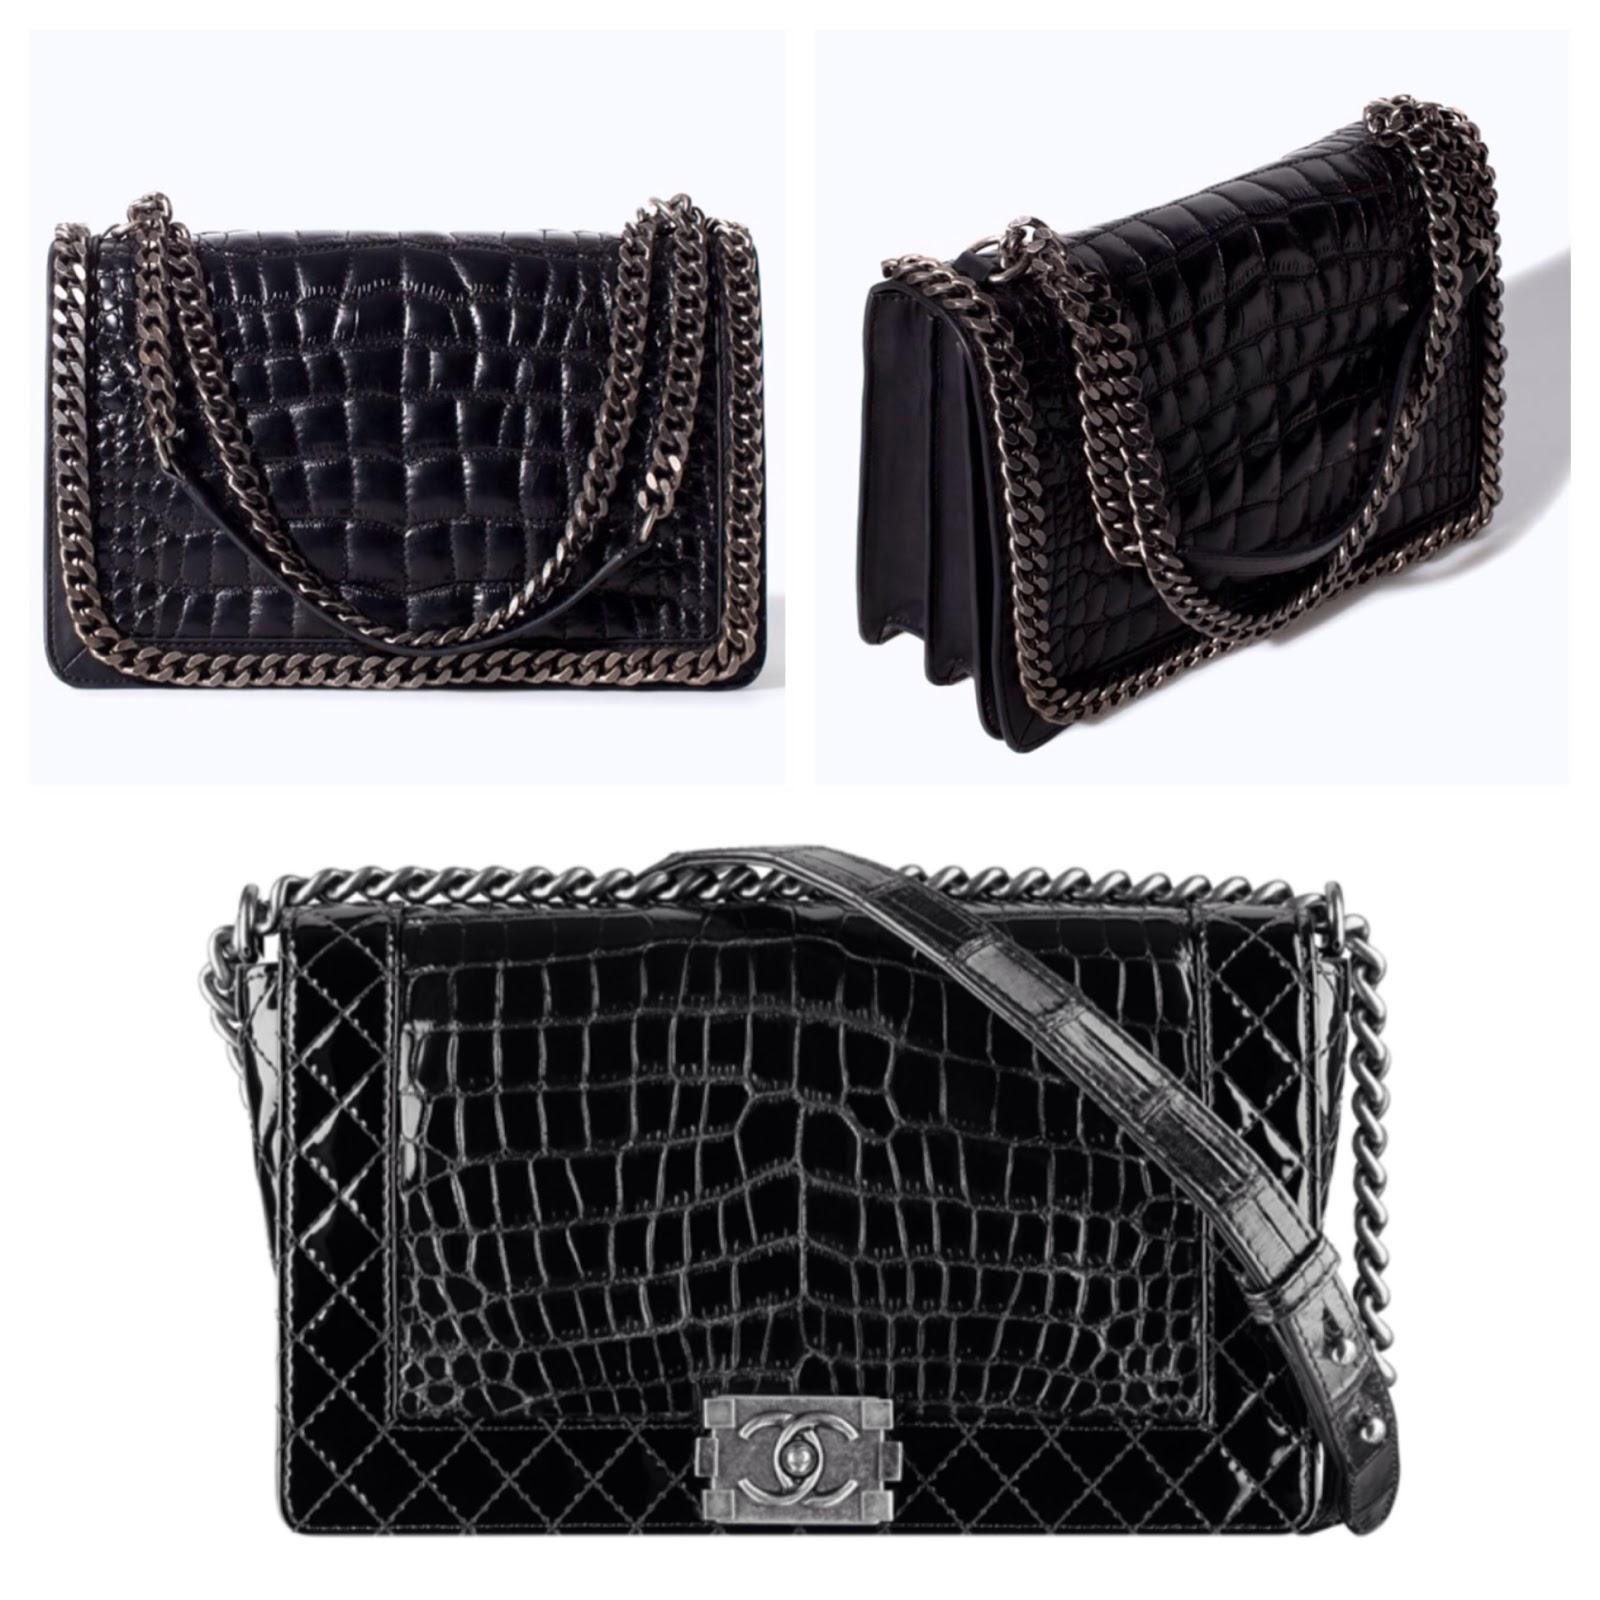 6bdacd495fd4 Top: multiple views of Crocodile pattern leather